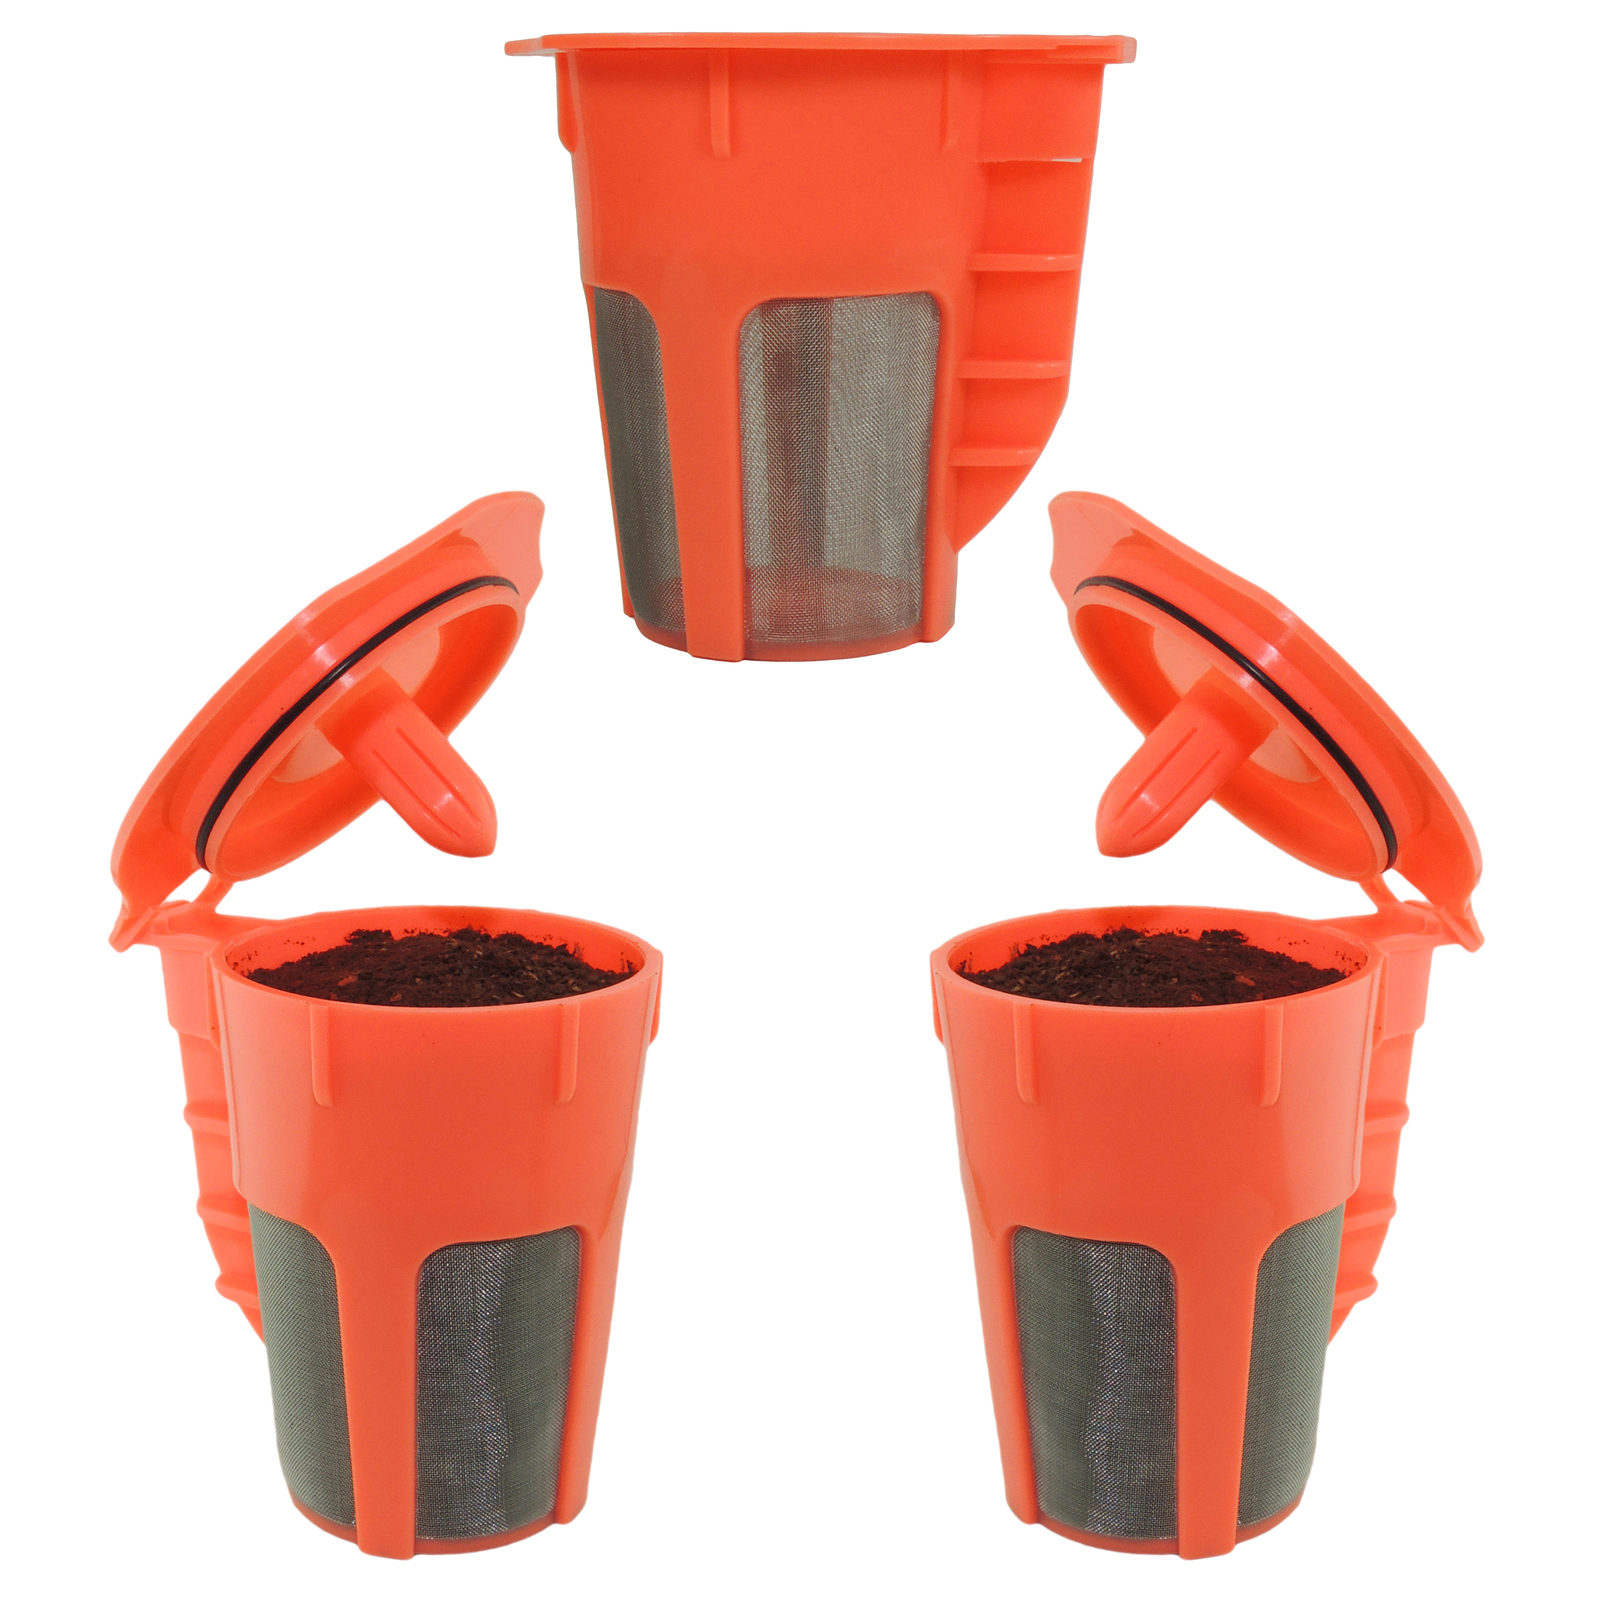 Keurig 2.0 k carafe k cups refillable k cup  coffee filter reusable carafe 3 pack